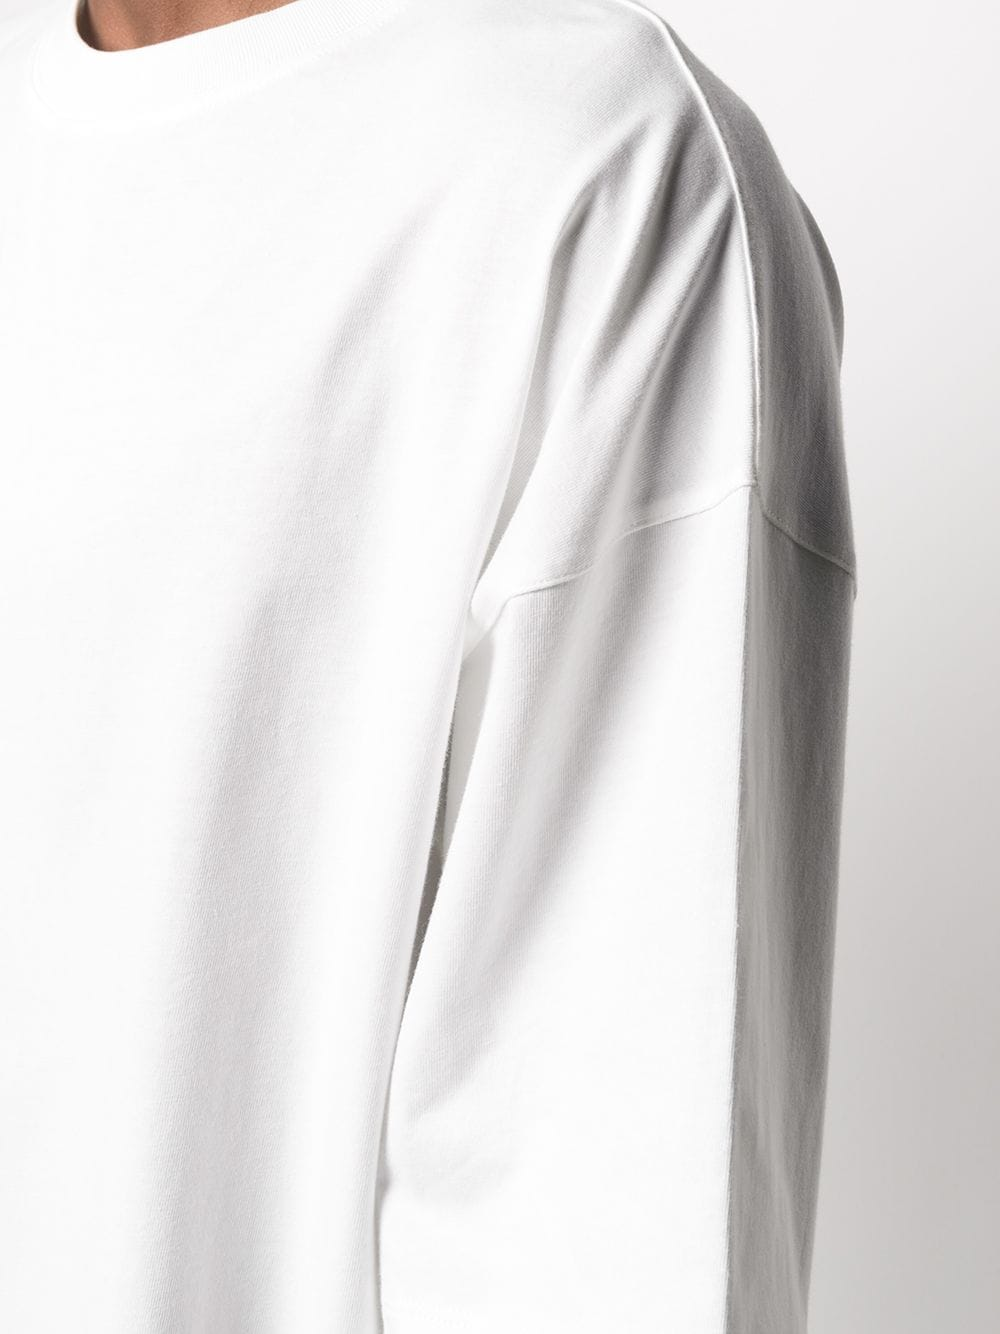 Dries Van Noten t-shirt basic uomo DRIES VAN NOTEN | T-shirt | HEN2603OFFWHITE